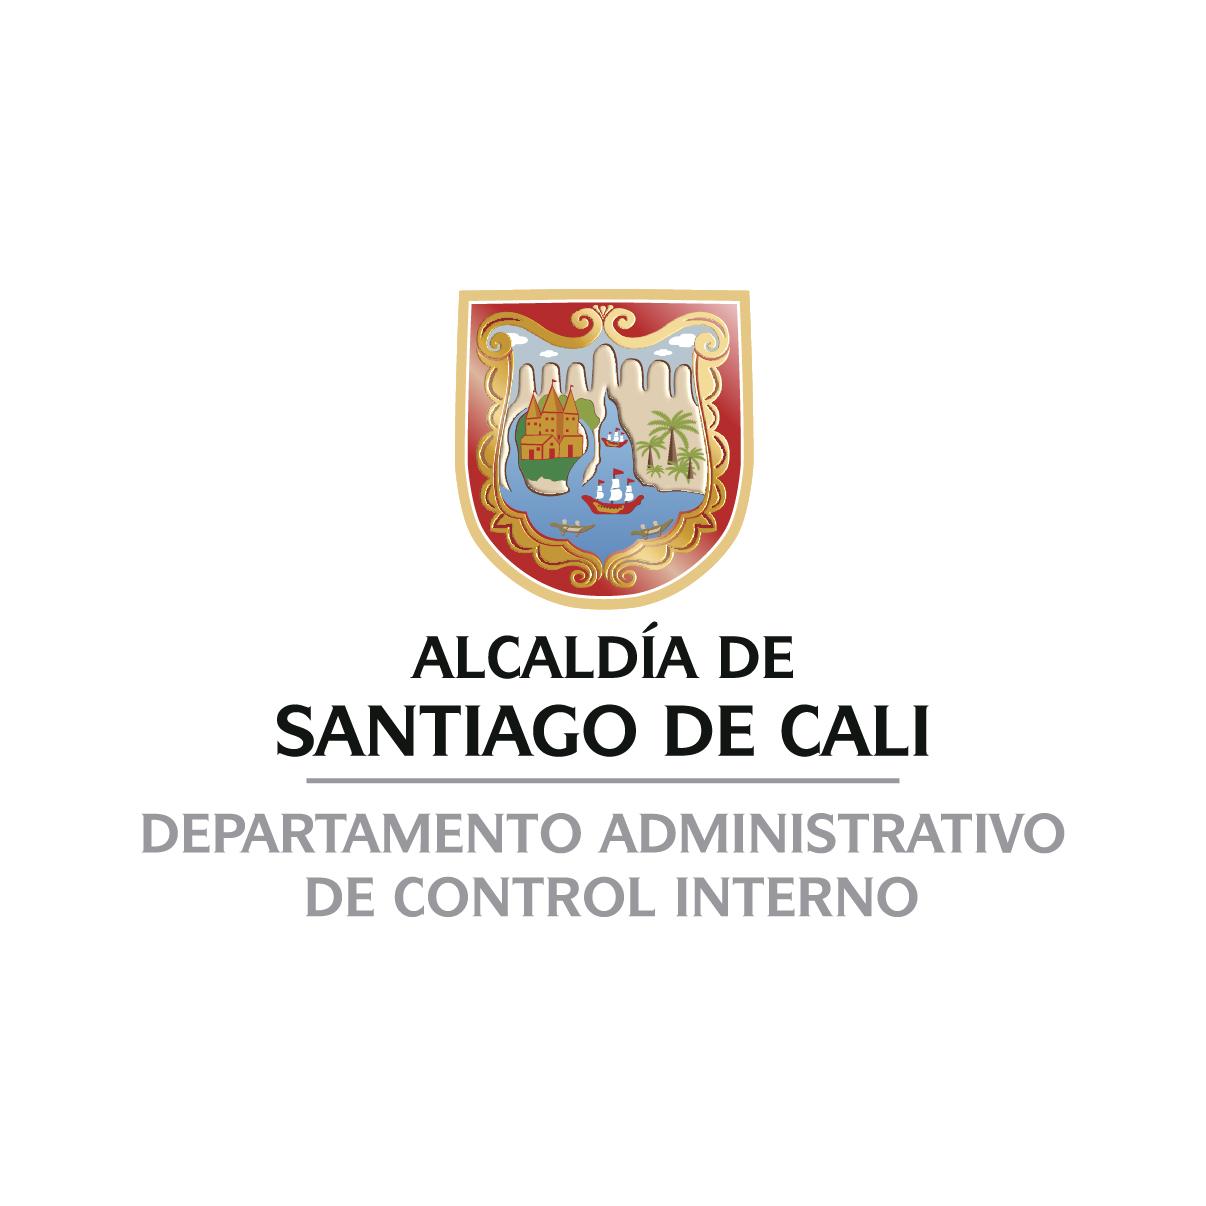 departamento-administrativo-de-control-interno